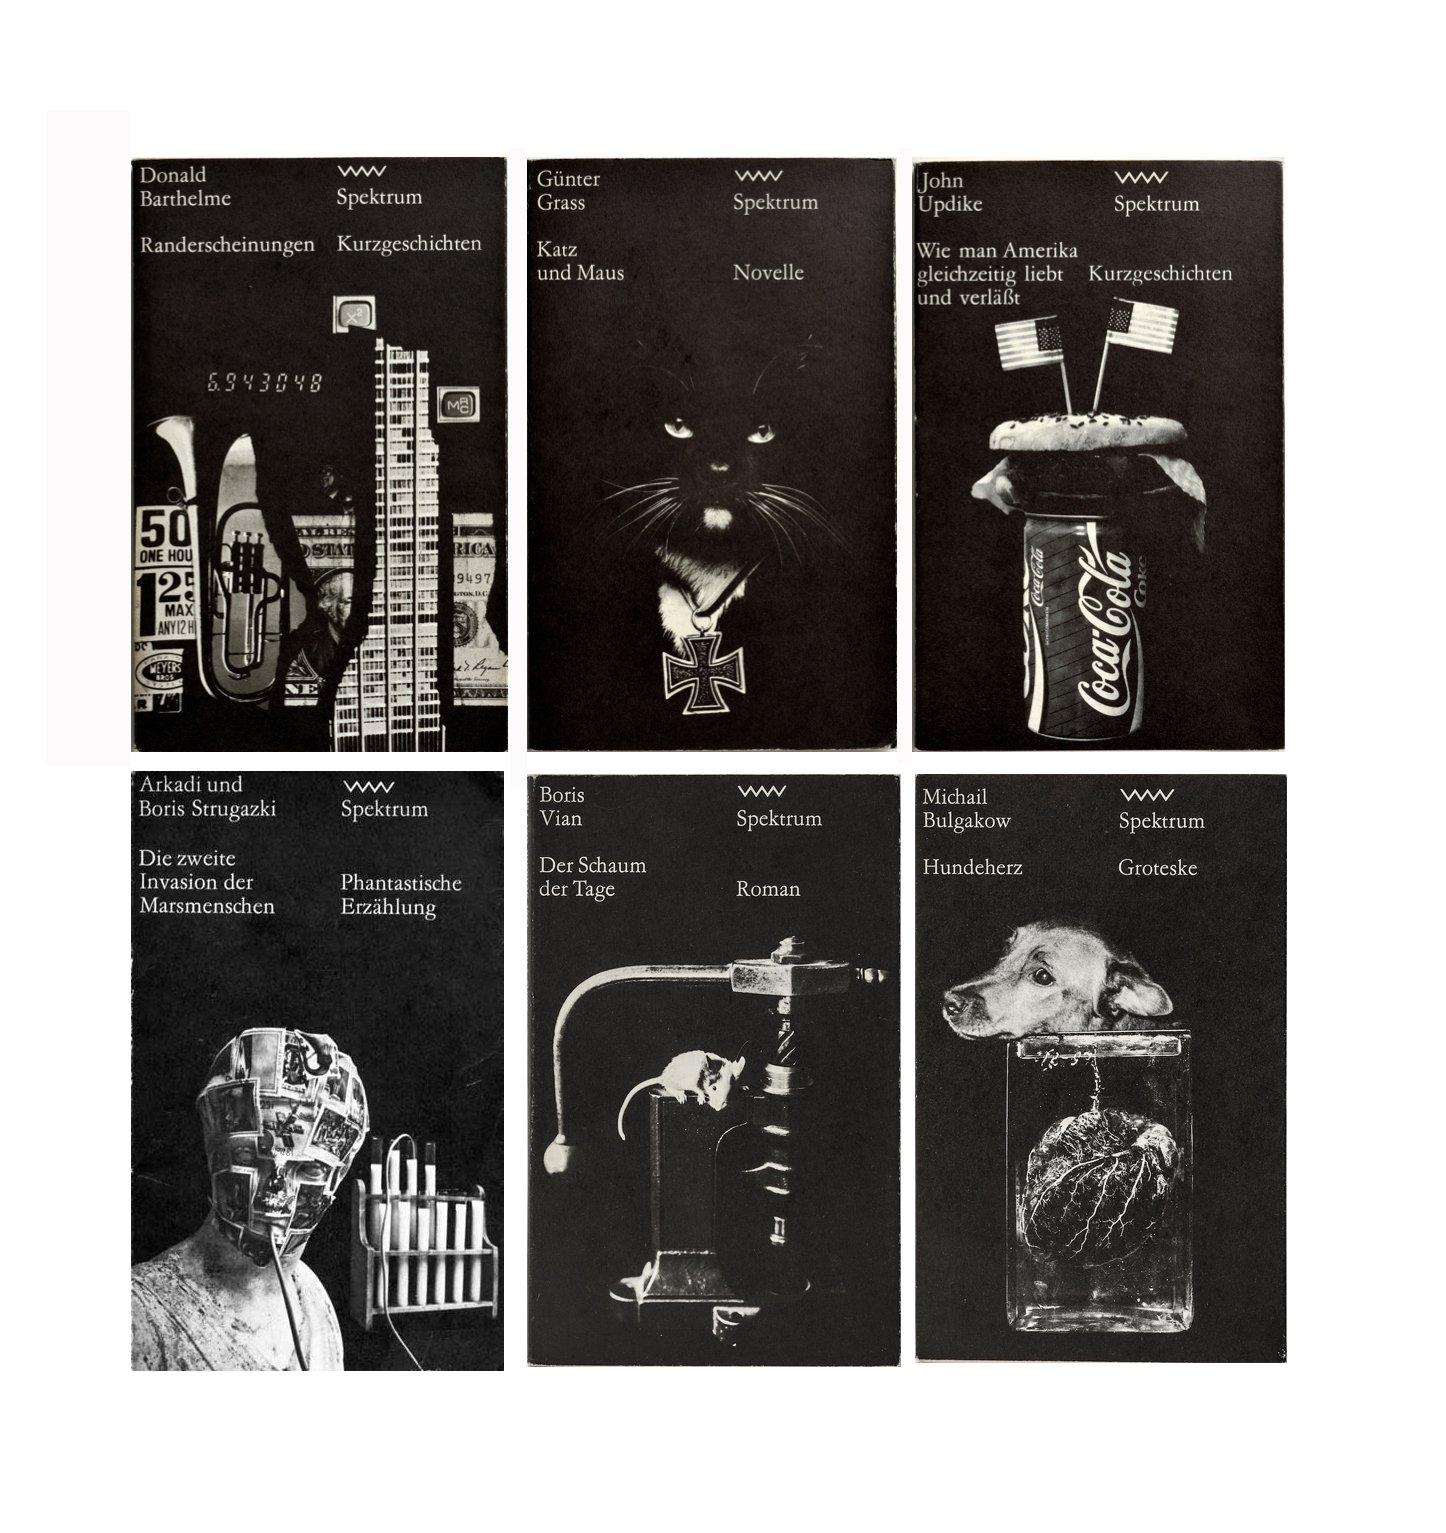 Spektrum paperback series Design: Lothar Reher https://t.co/E53zjXbmHi